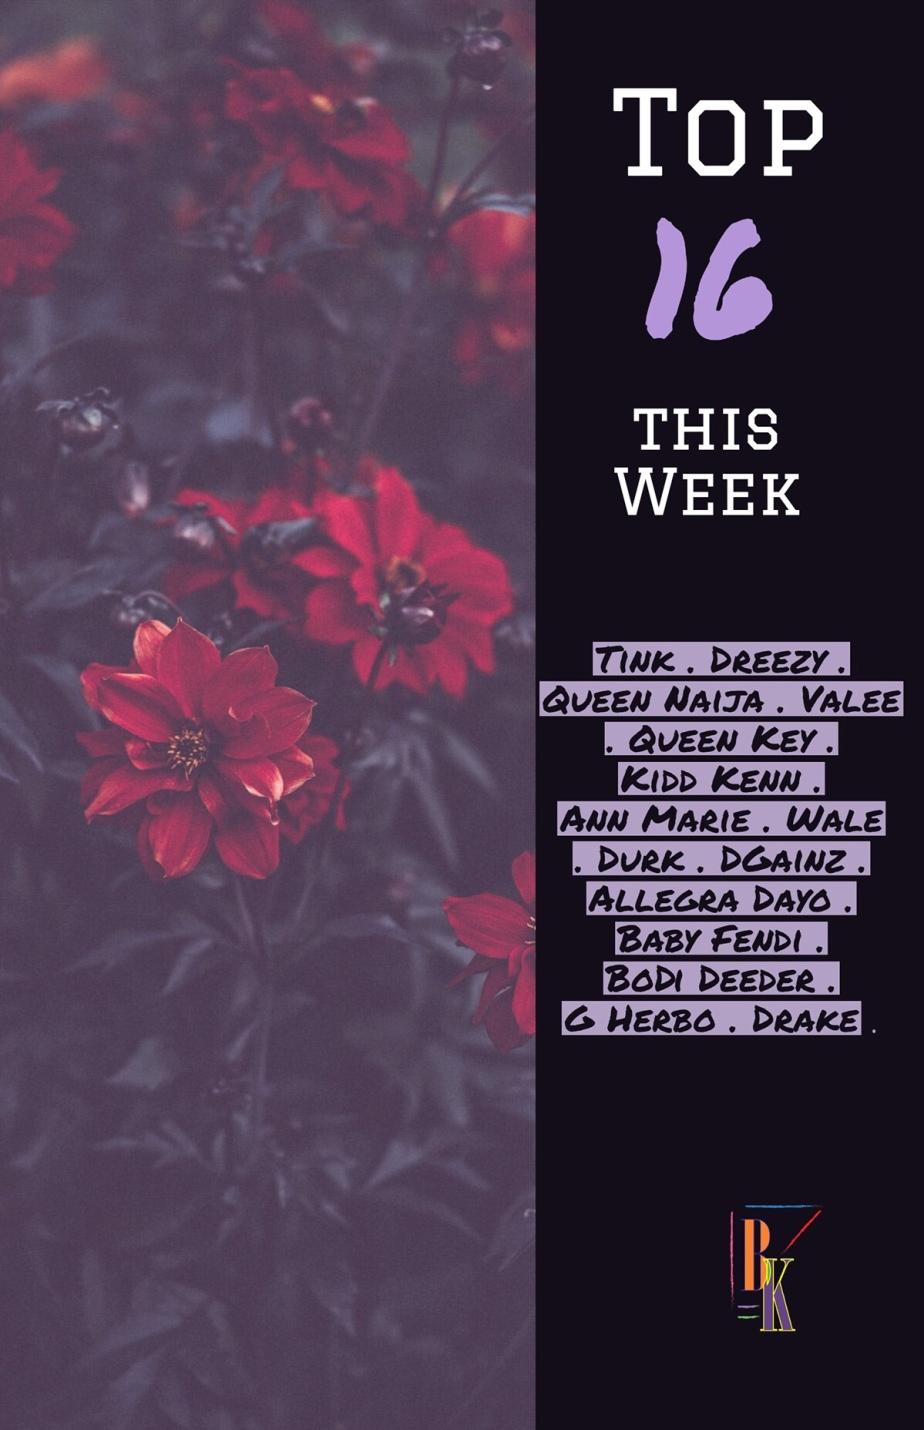 Weekly Discovers and Releases: @Official_Tink @dreezydreezy @queennaija @valee @KeyisQueen @KingL @KiddoKenn @Im__AnnMarie @Wale @Jacquees @lildurk @TkKravitz @1GunnaGunna @DGainz  @allegradayo @iambabyfendi @BoDiDeederRMG @gherbo @sizzle808MAFIA@Drake